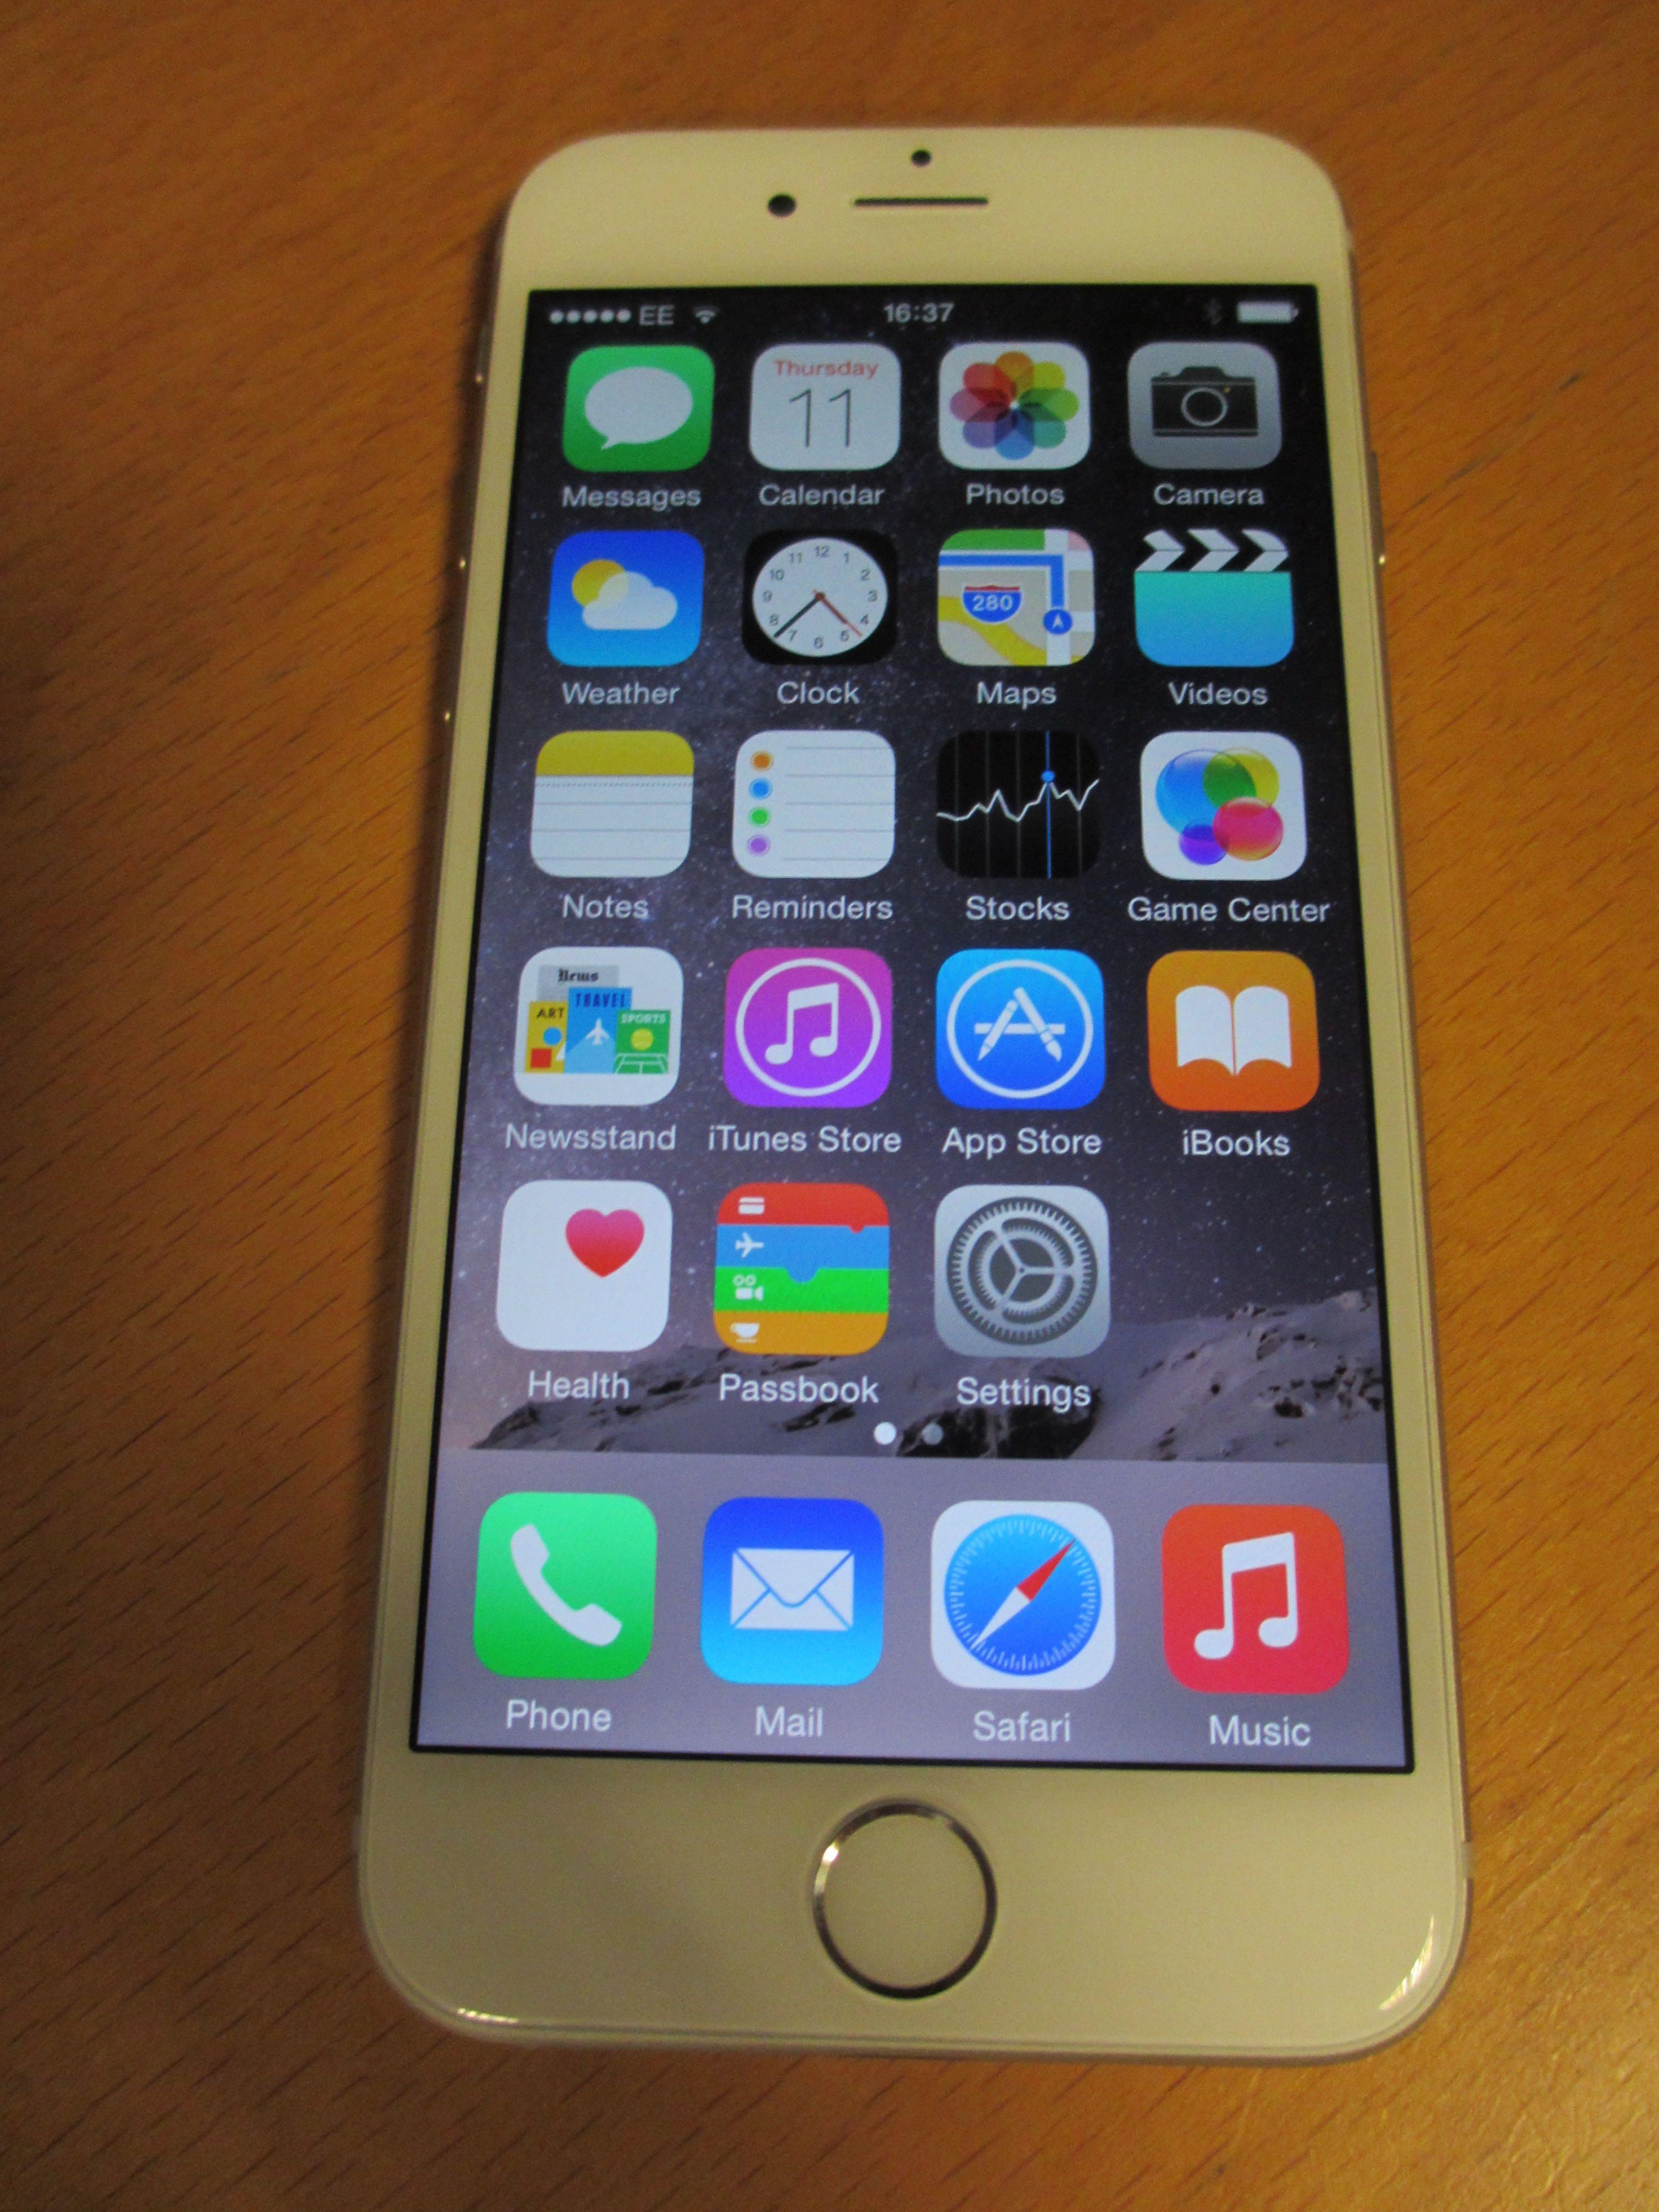 Refurbished Iphone 6 64gb Silver Unlocked Mresellcouk Storage White Product Age 3 Months